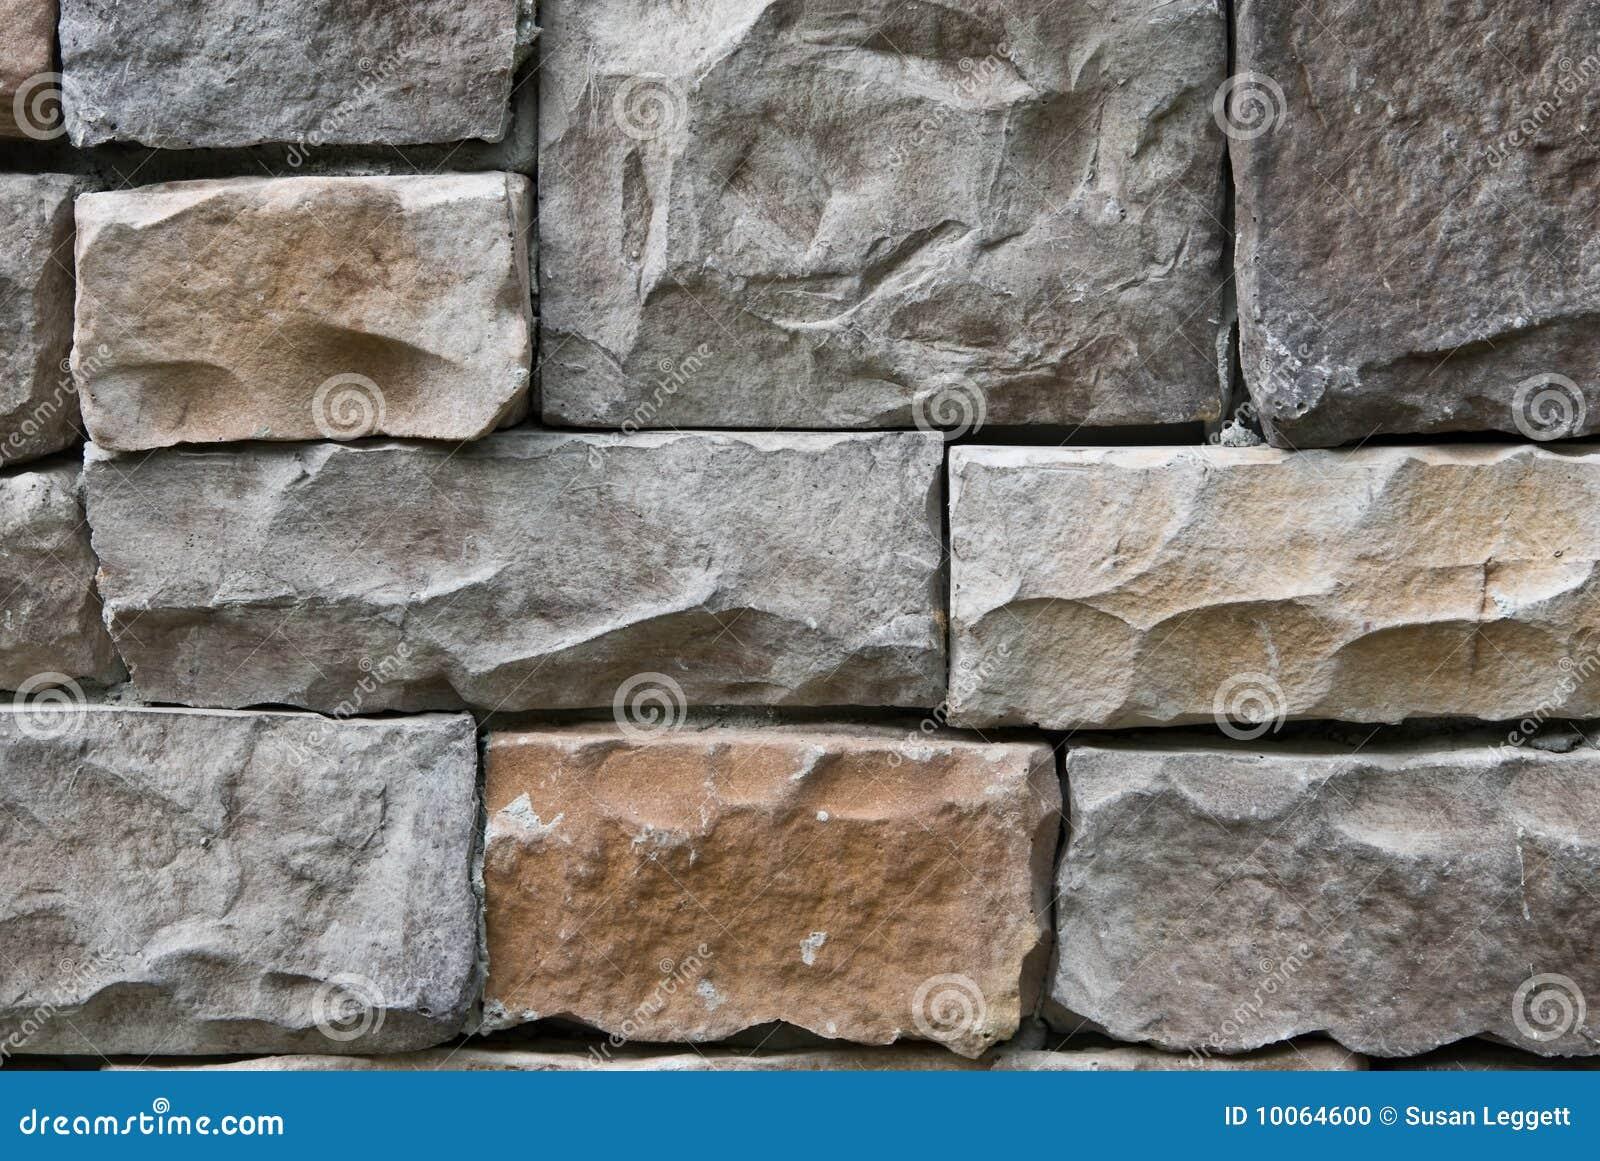 Pedra/rocha/fundo